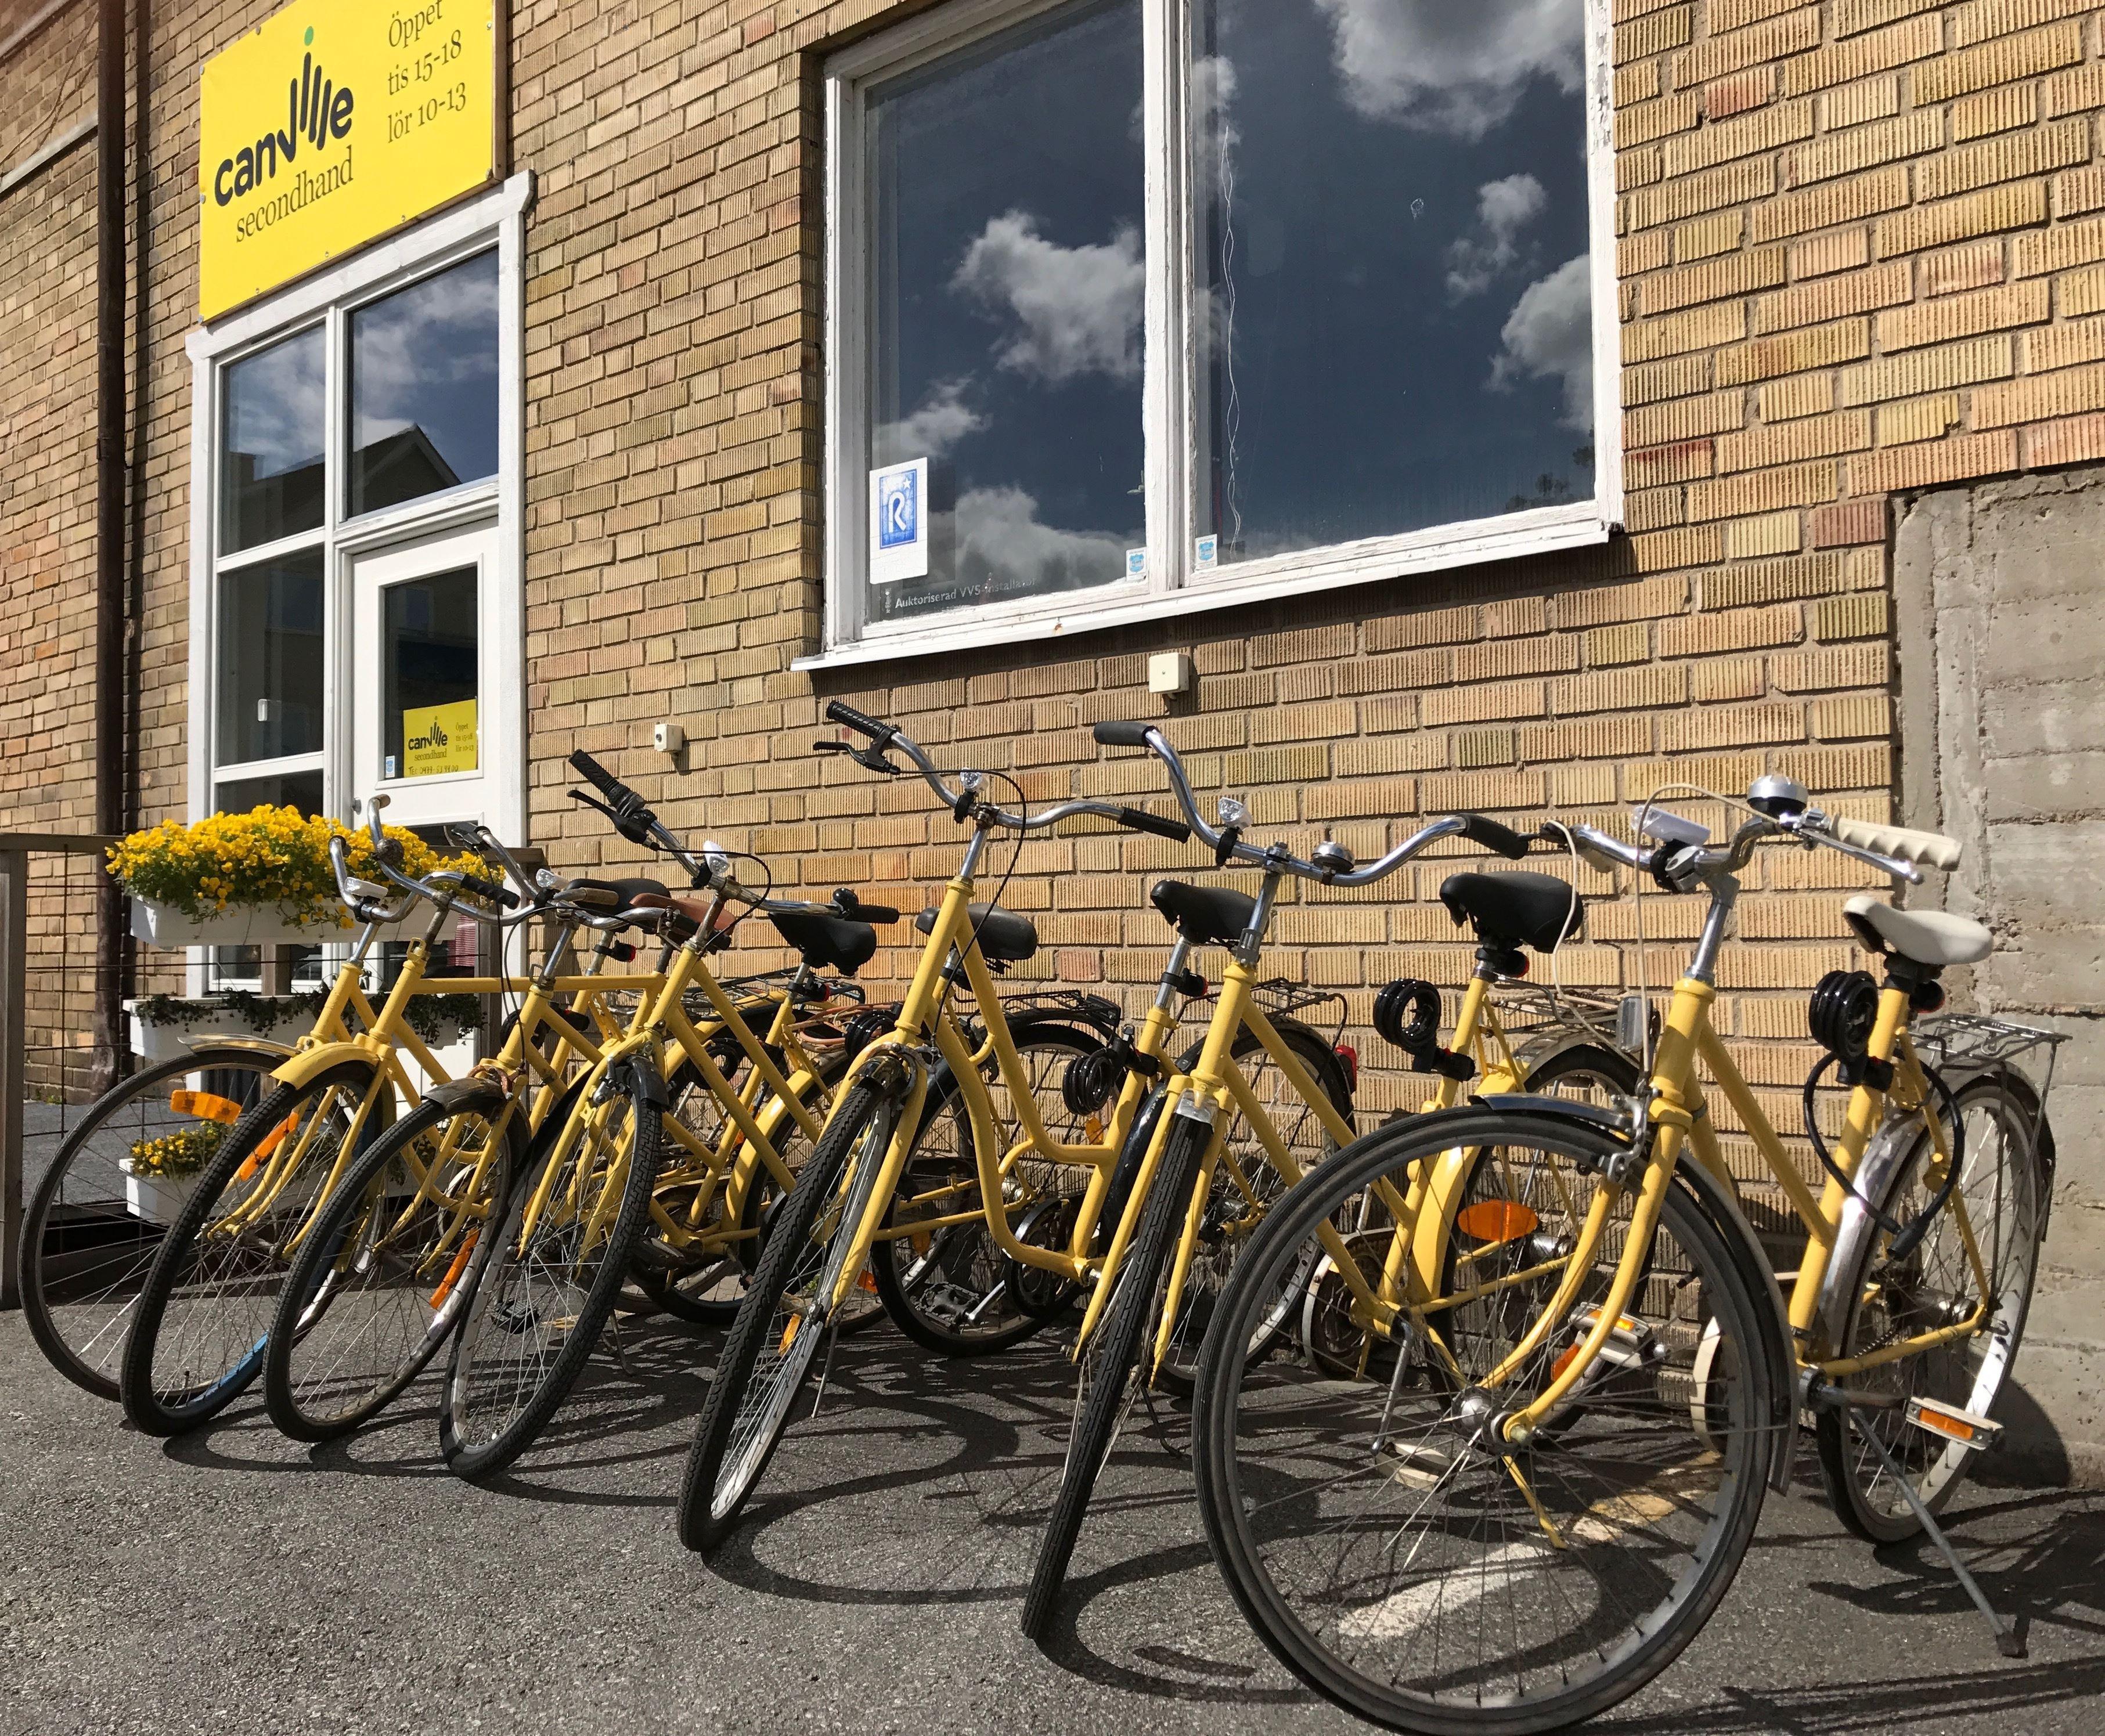 Canville - Bike Rental